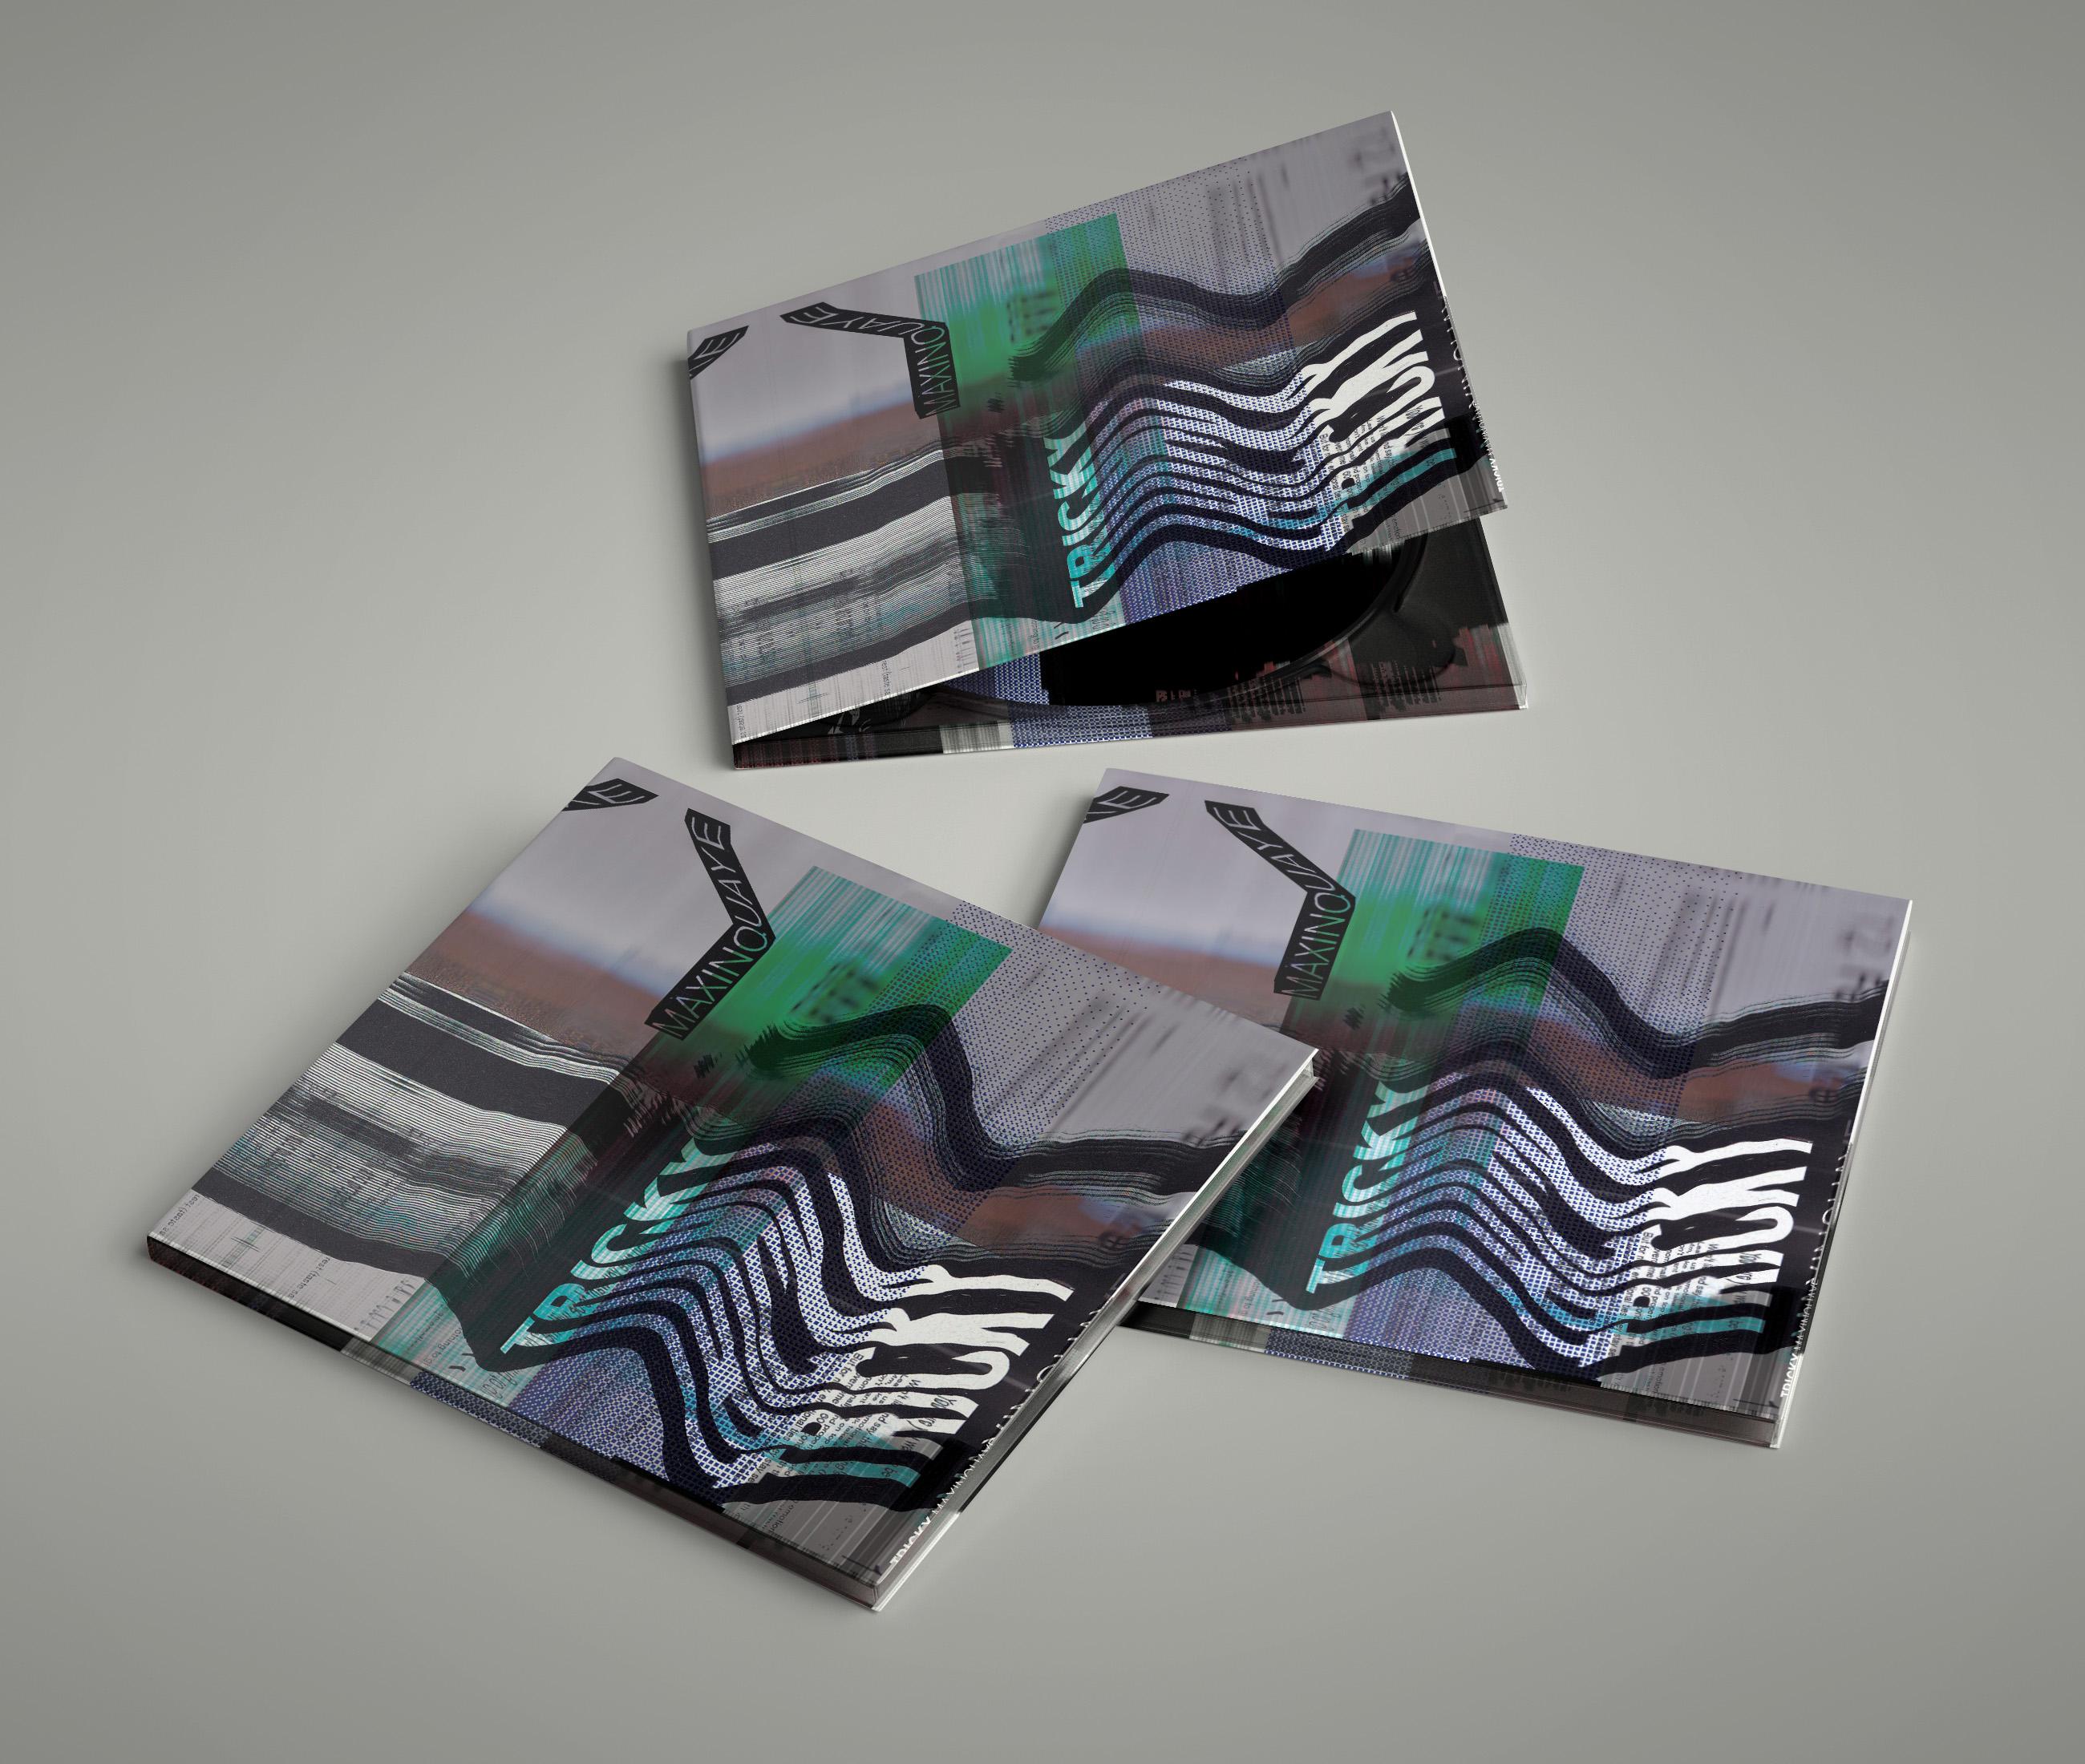 Tricky-Maxinquaye///Album Cover by Andrei Alecsandru Pantea - Creative Work - $i